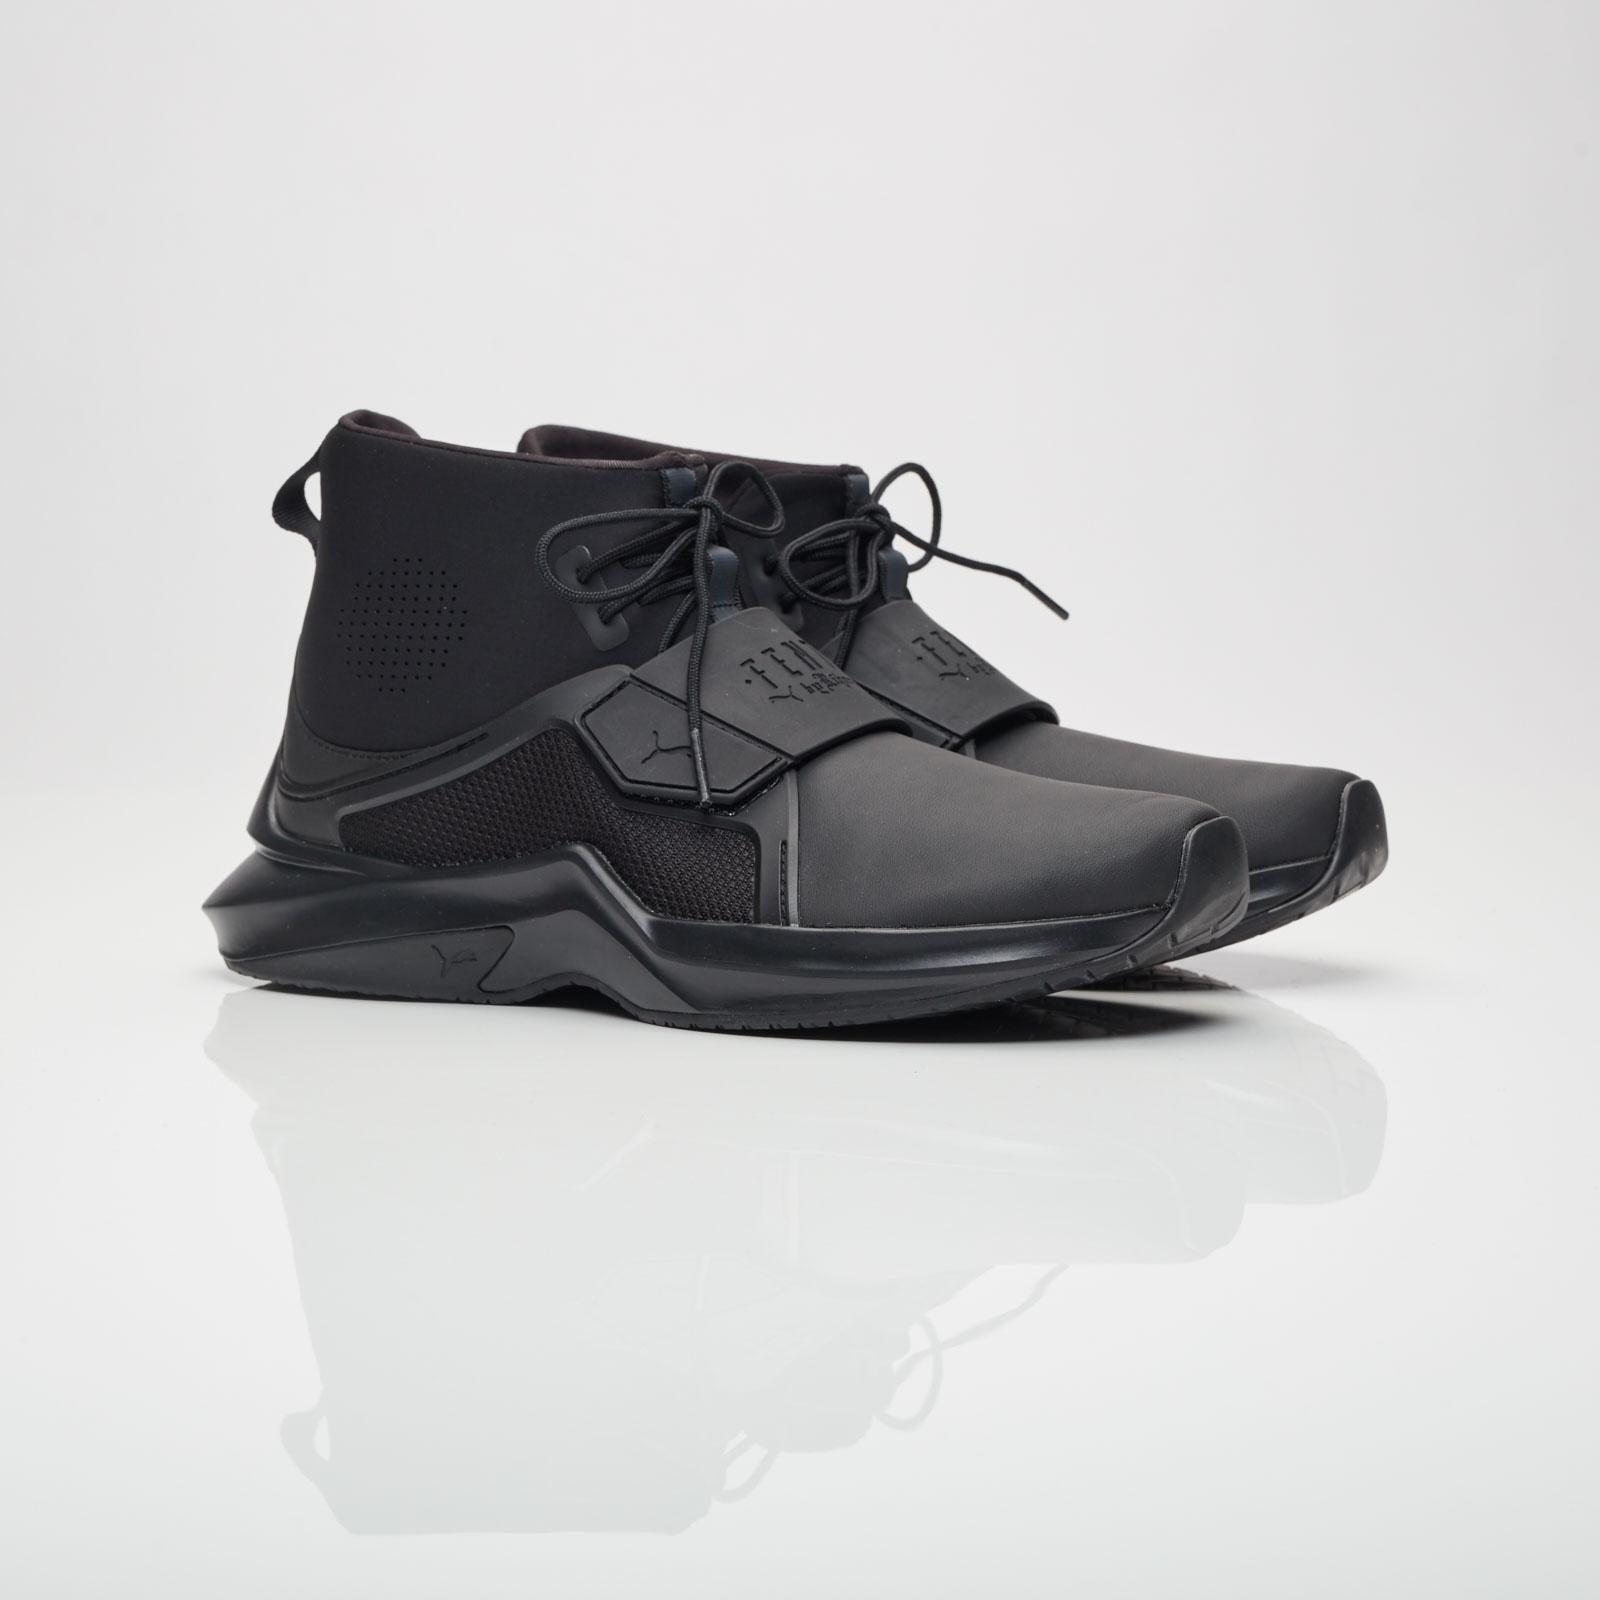 b1dc07e5021 Puma Fenty Hi Leather Wns - 190398-01 - Sneakersnstuff